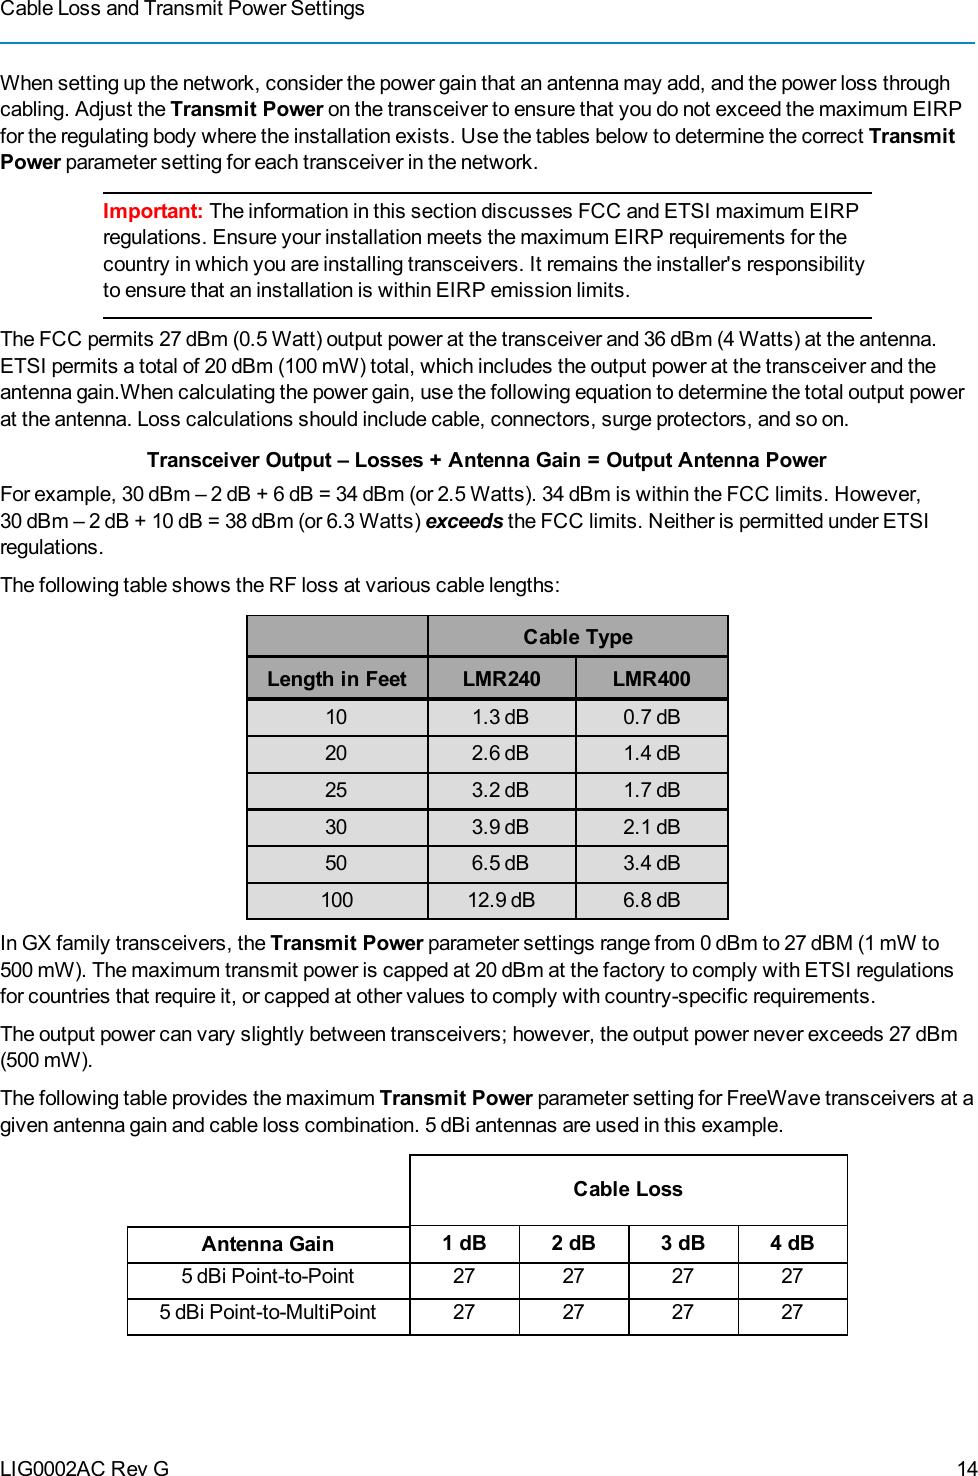 temenos t24 user guide pdf